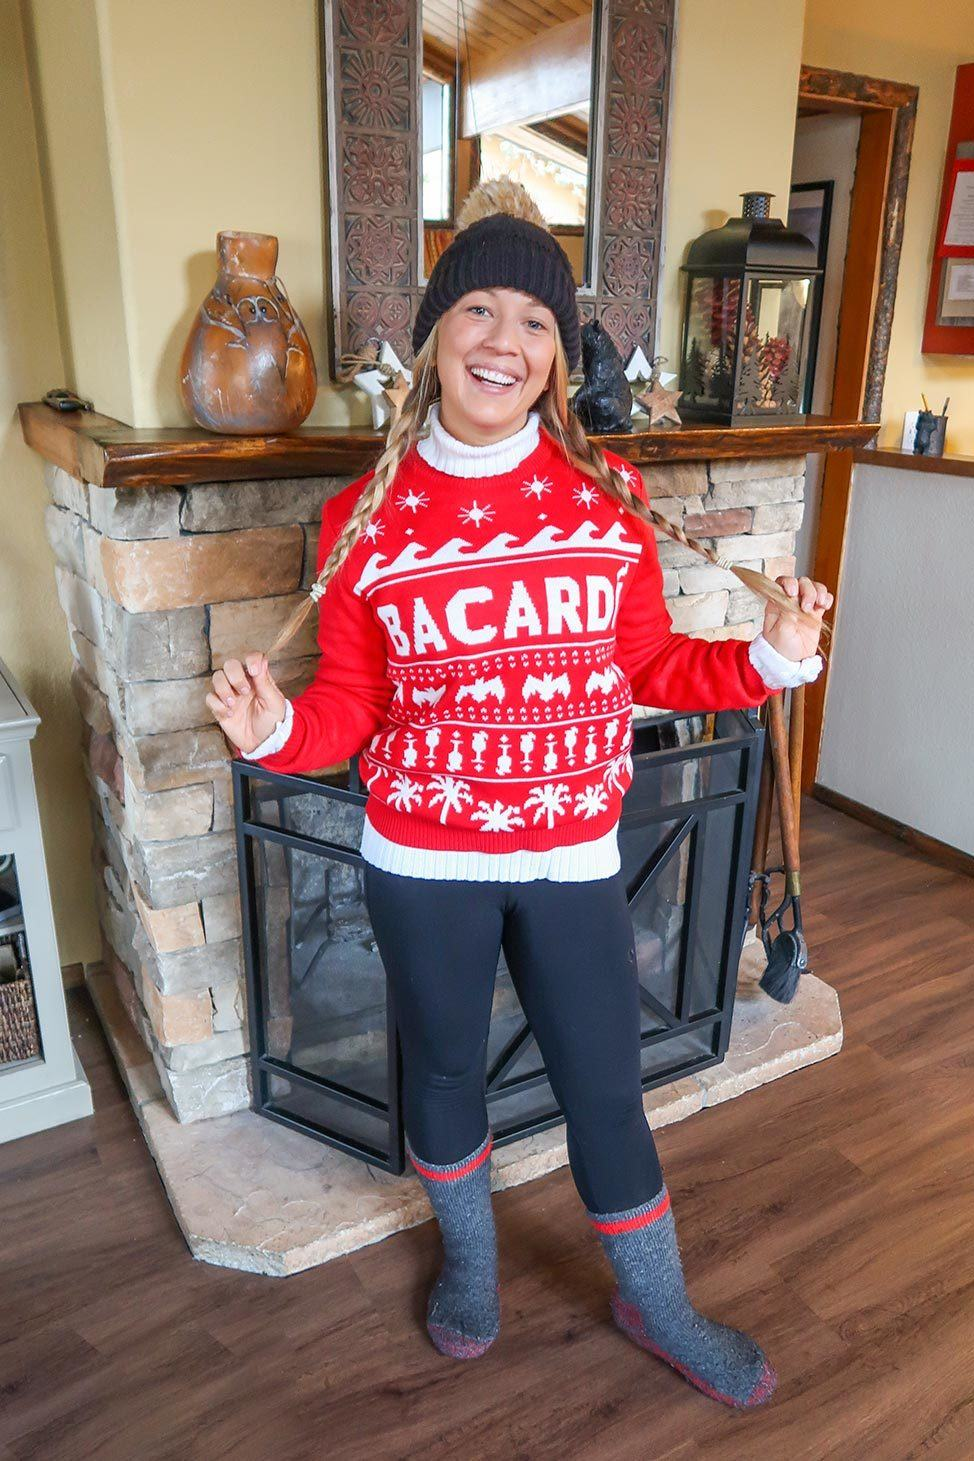 Bacardi Christmas Sweater